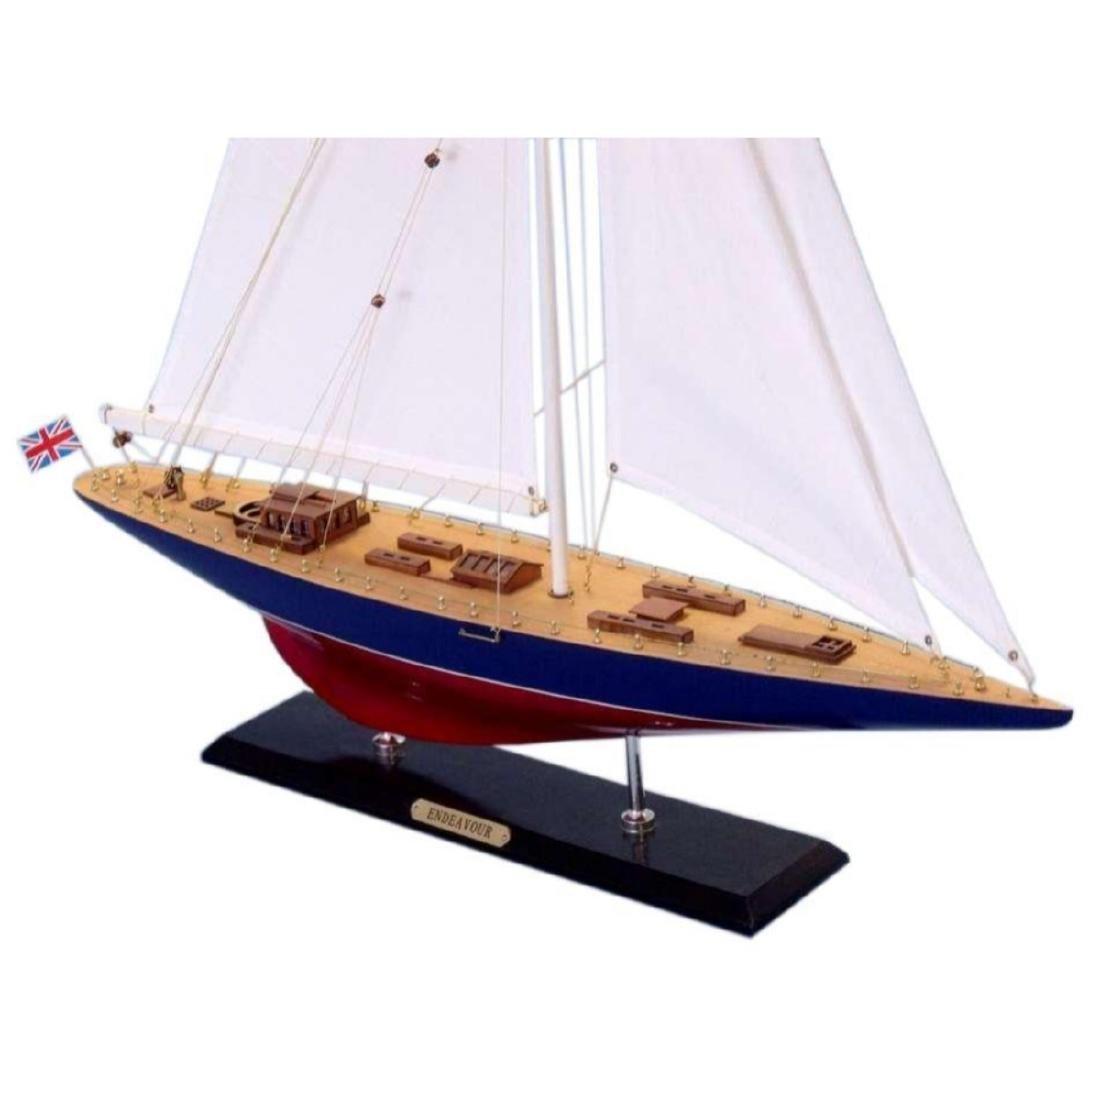 "Wooden Endeavour Limited Model Sailboat Decoration 35"" - 3"